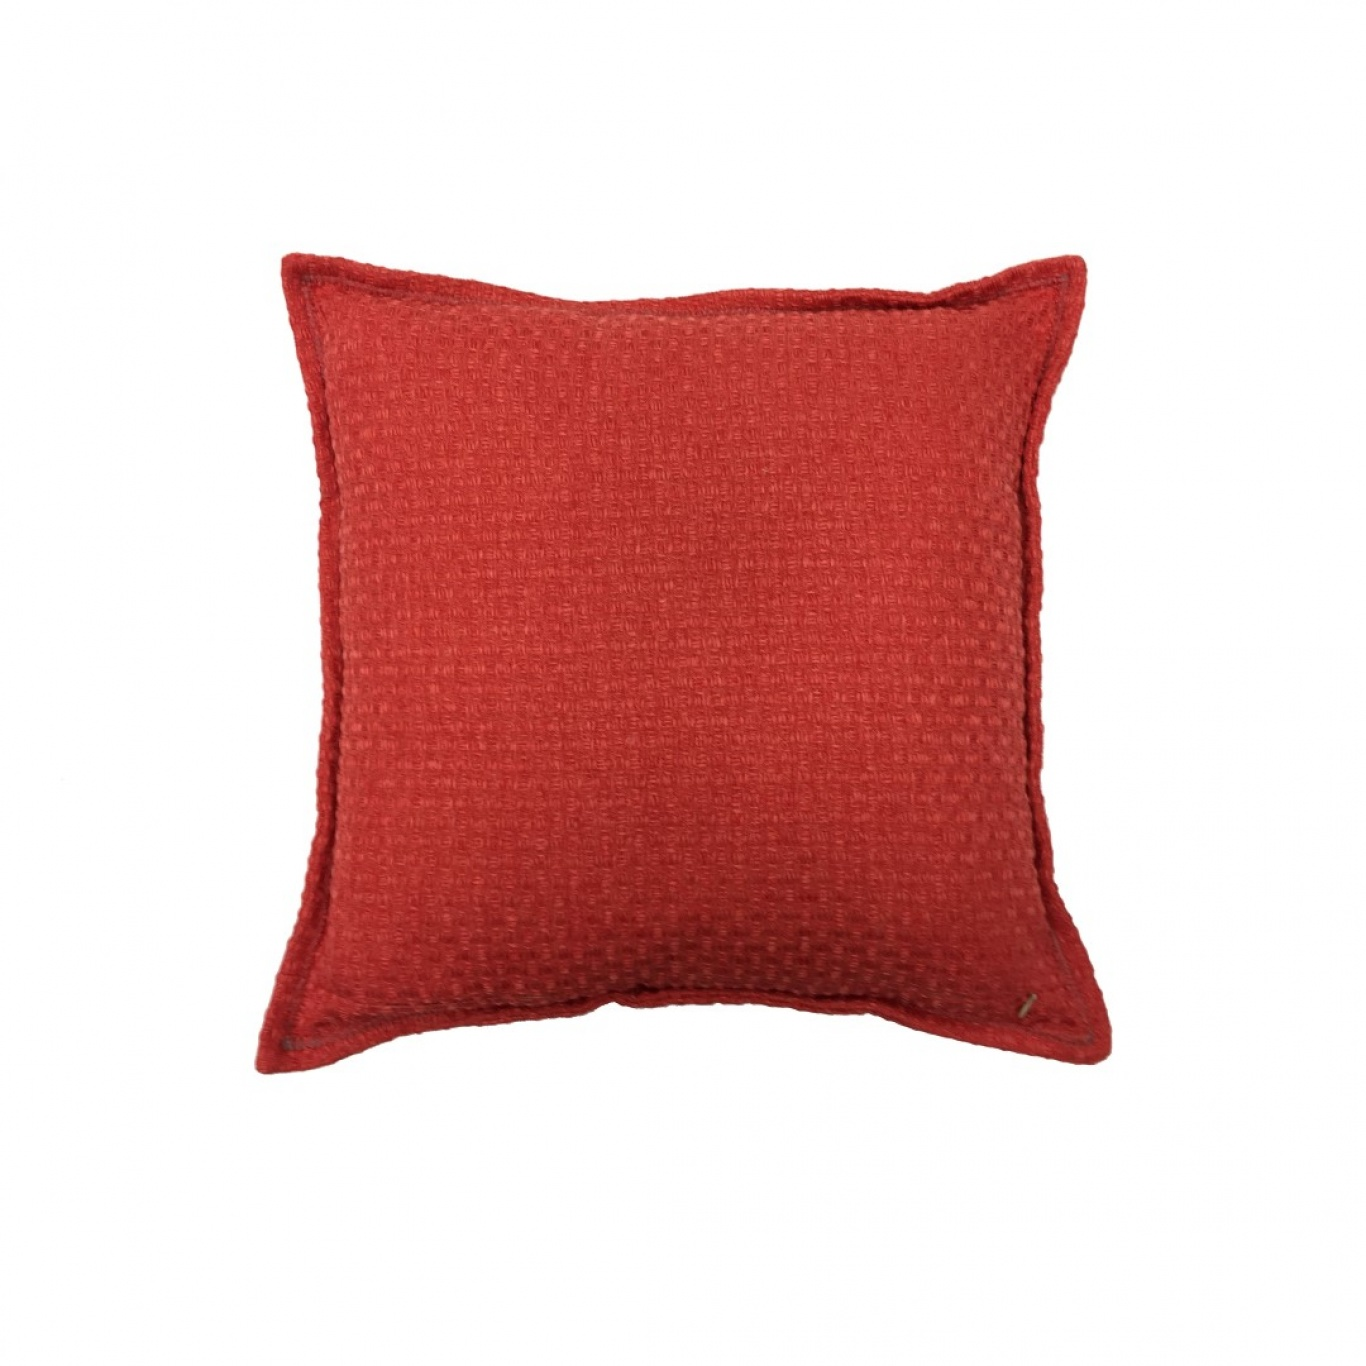 Image of Voyage Nessa Salsa Cushion